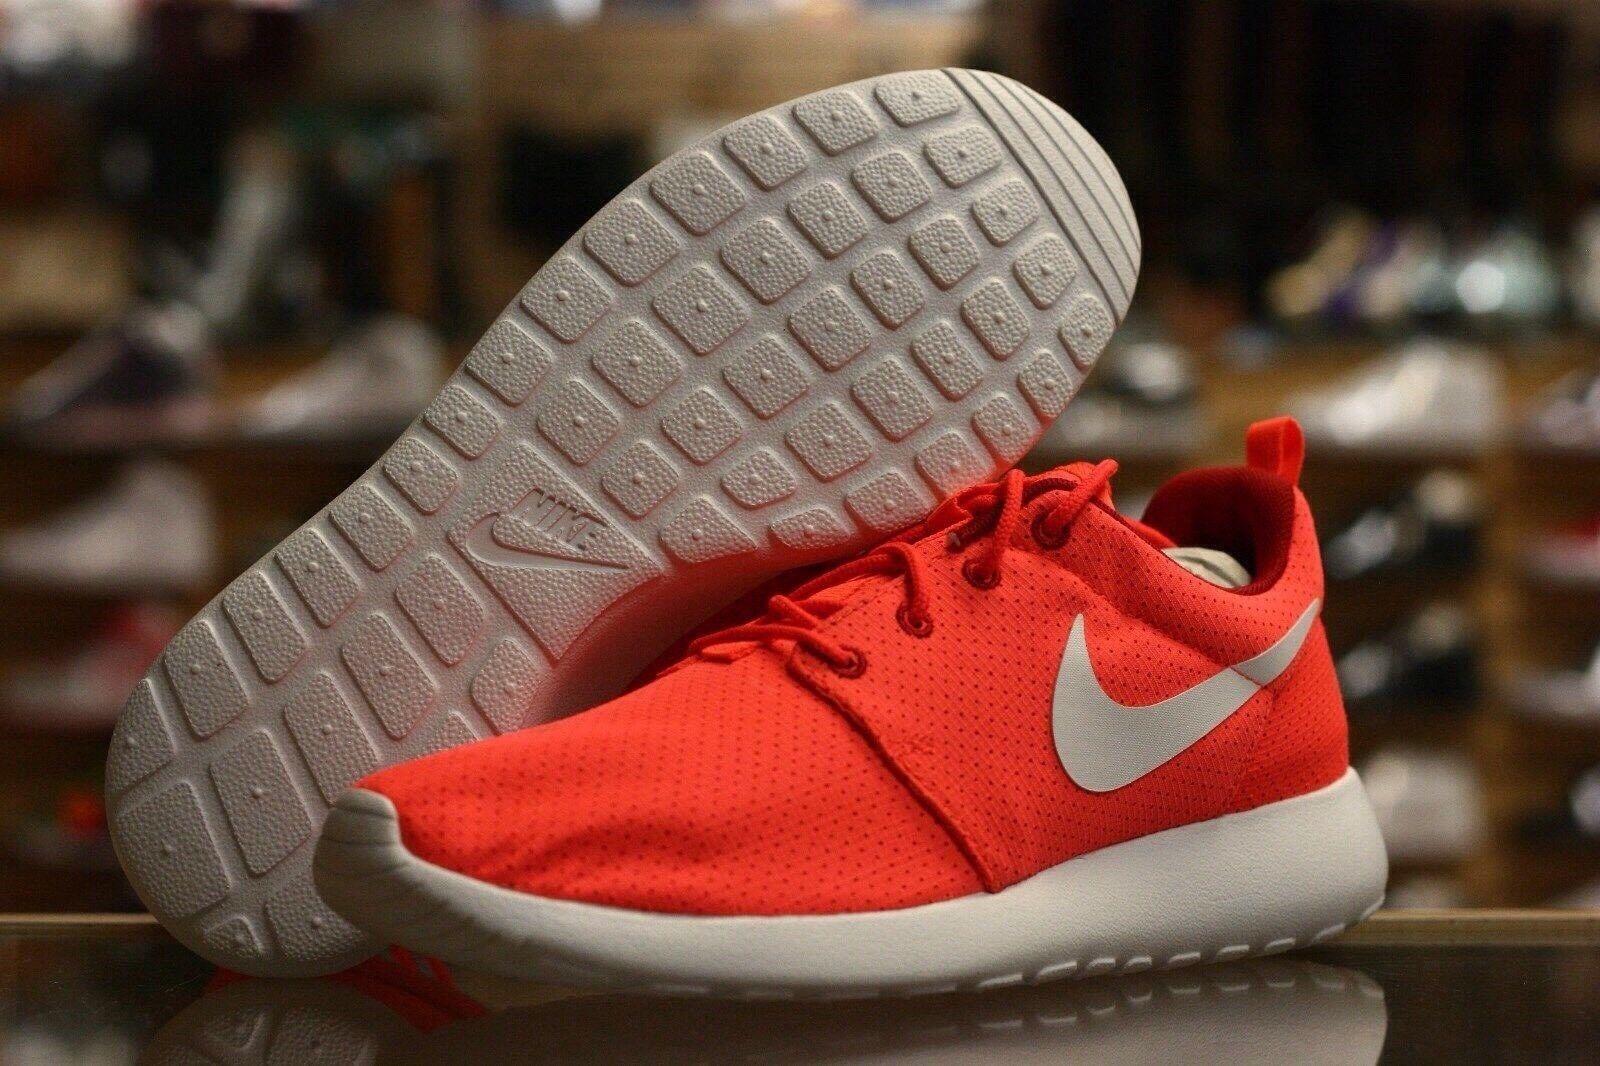 Nike rosherun uomini corre trainning scarpe autentico